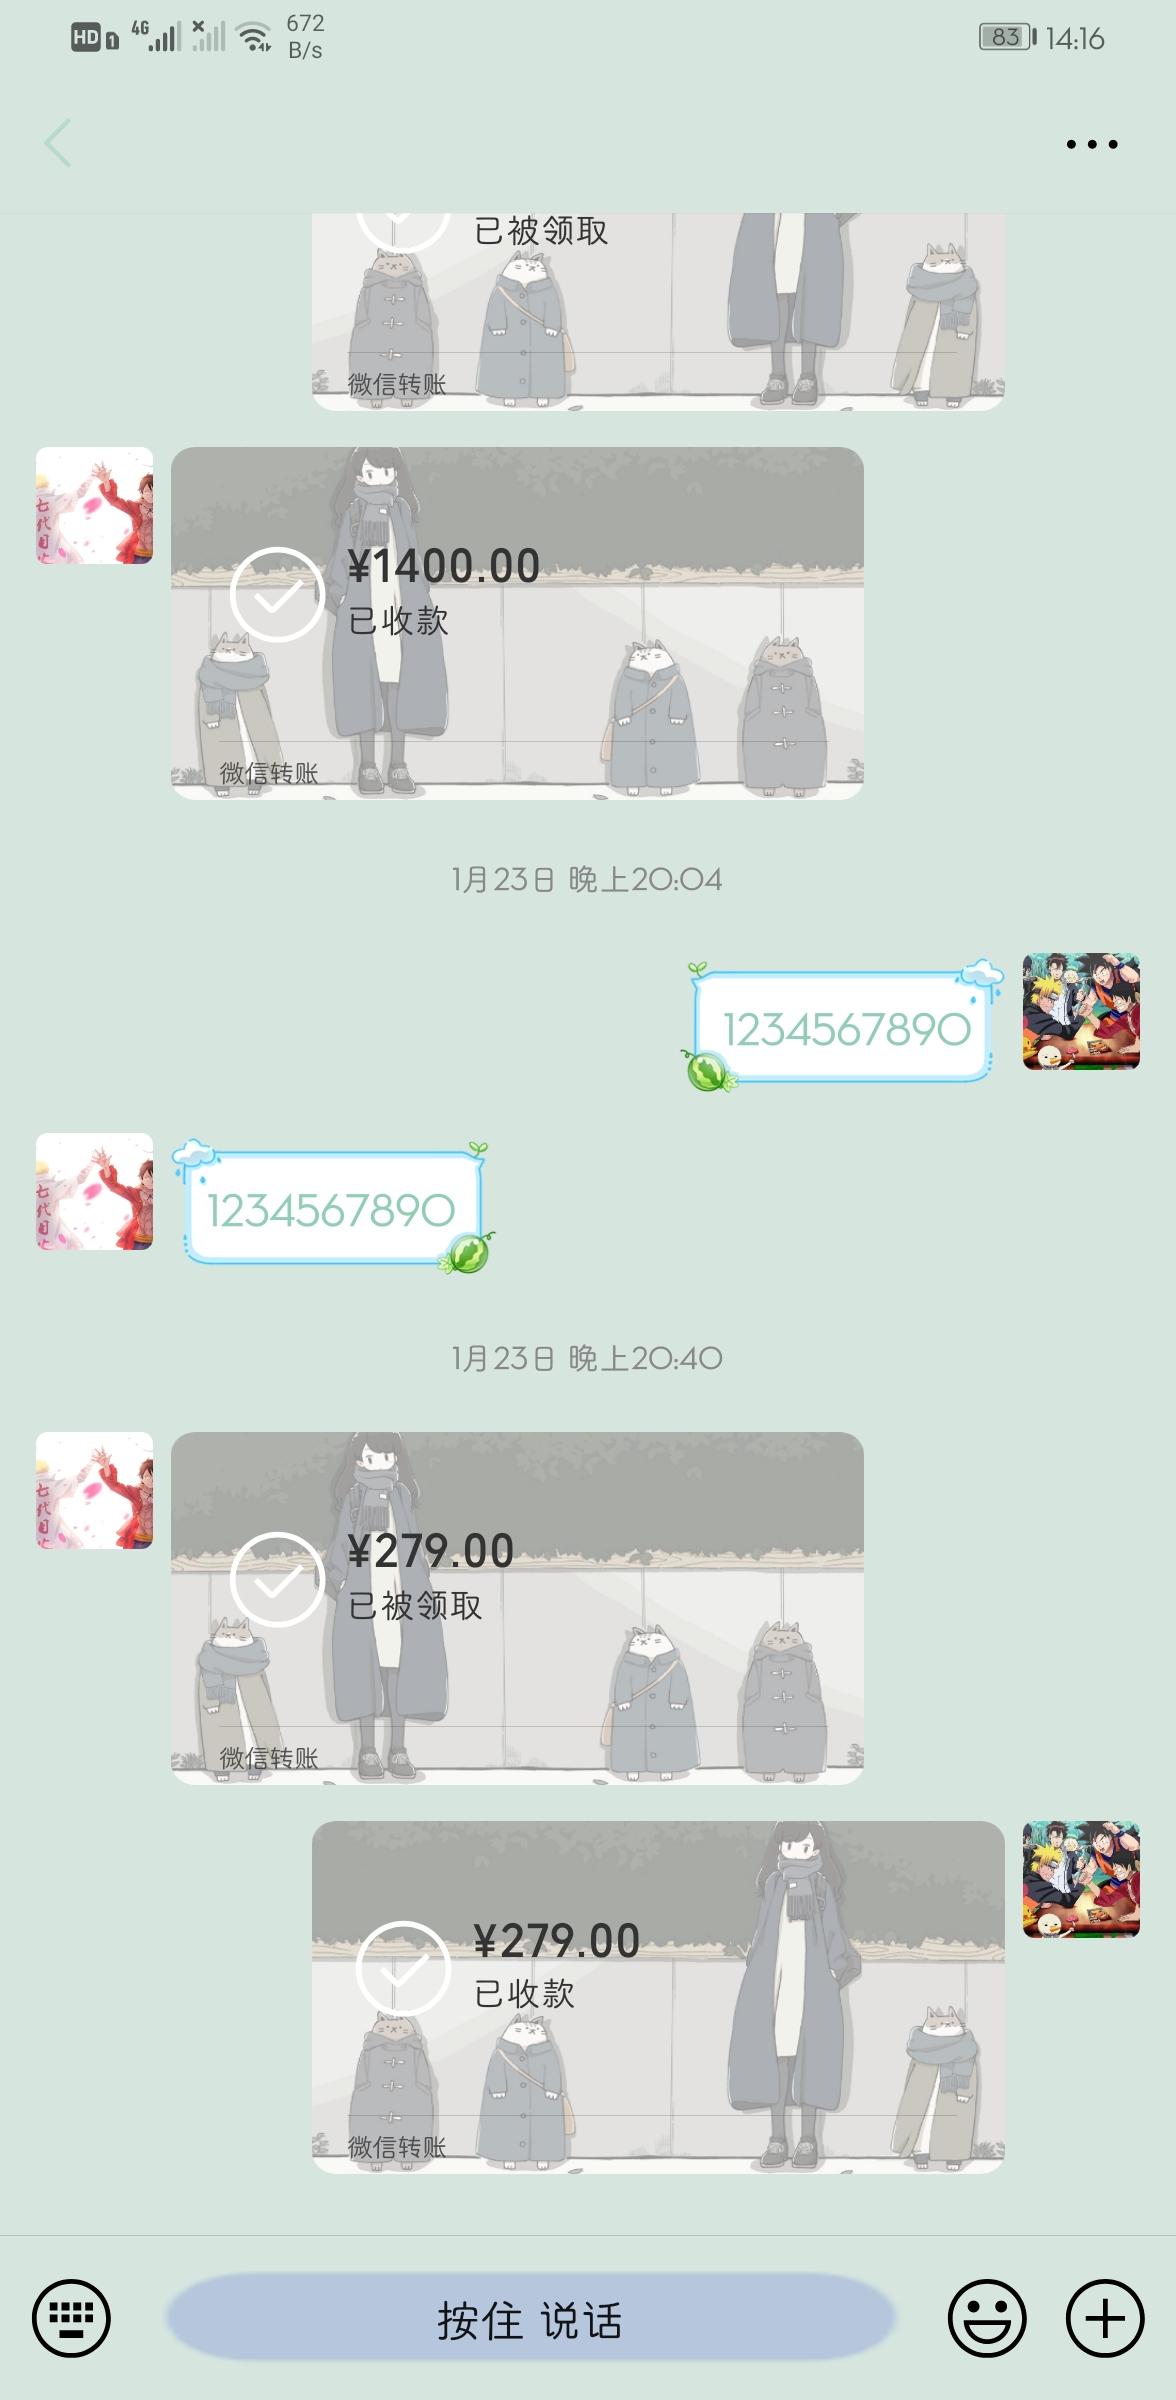 Screenshot_20210226_141610_com.tencent.mm.jpg